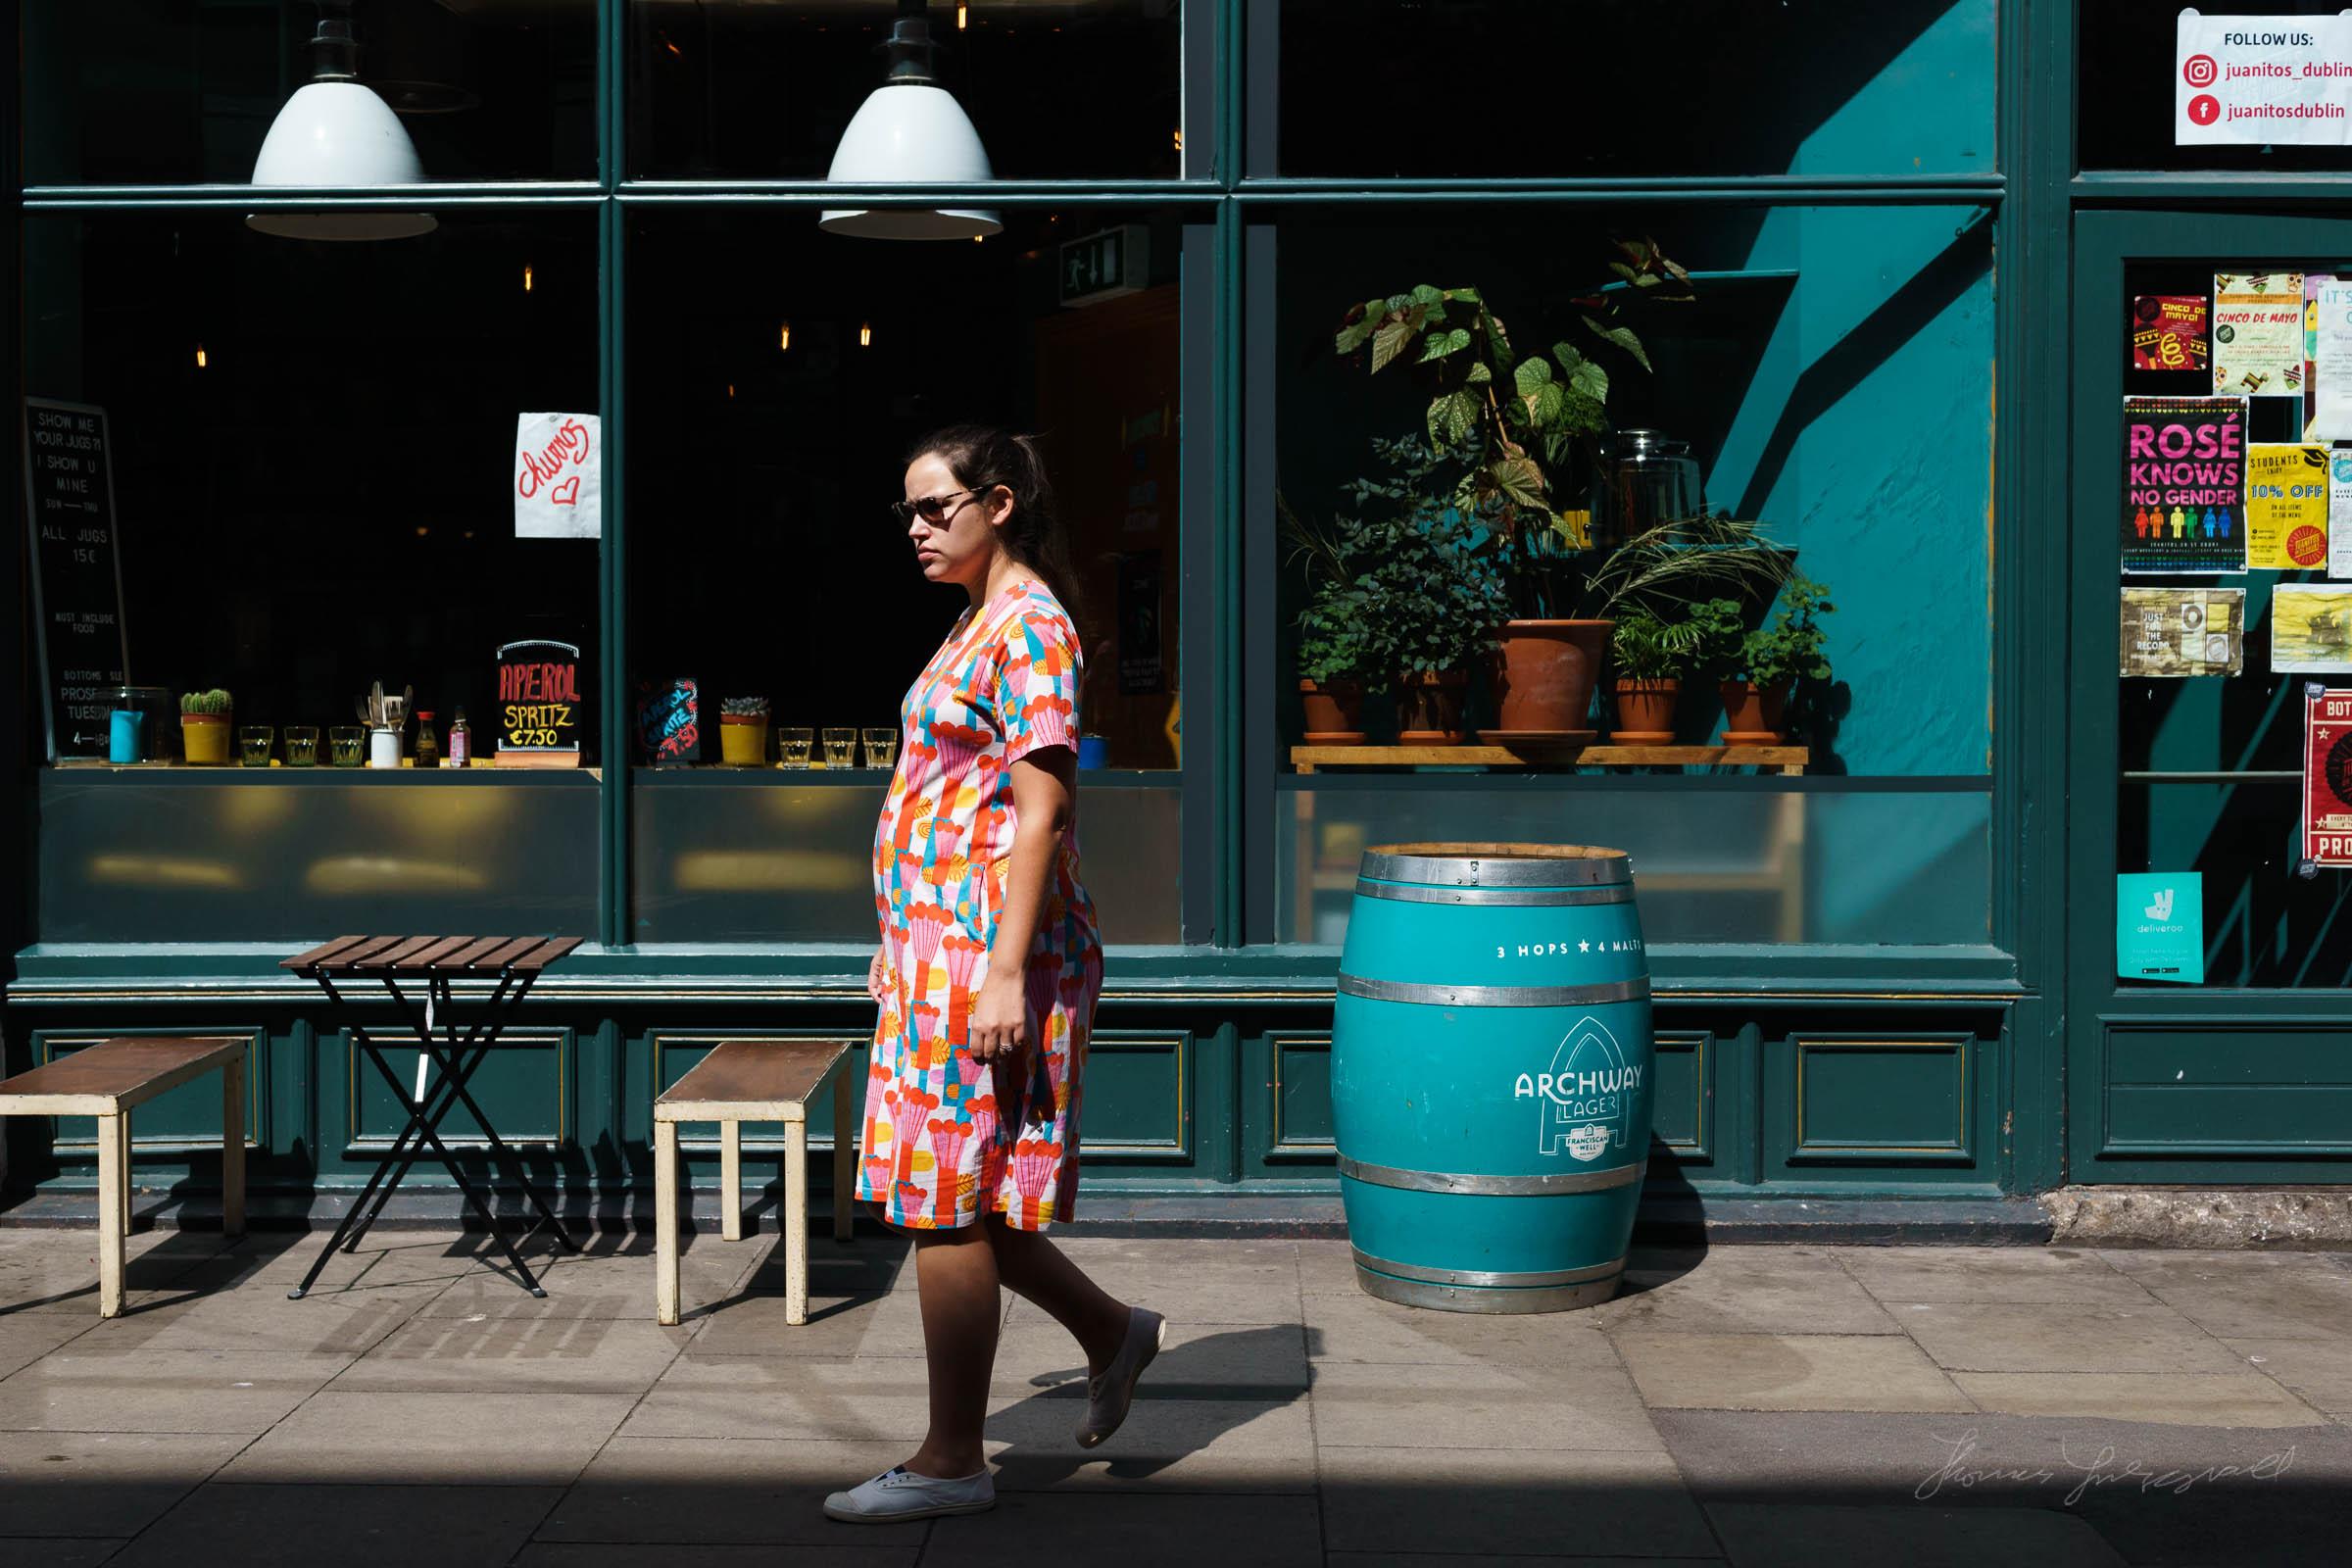 Woman in bright colour dress